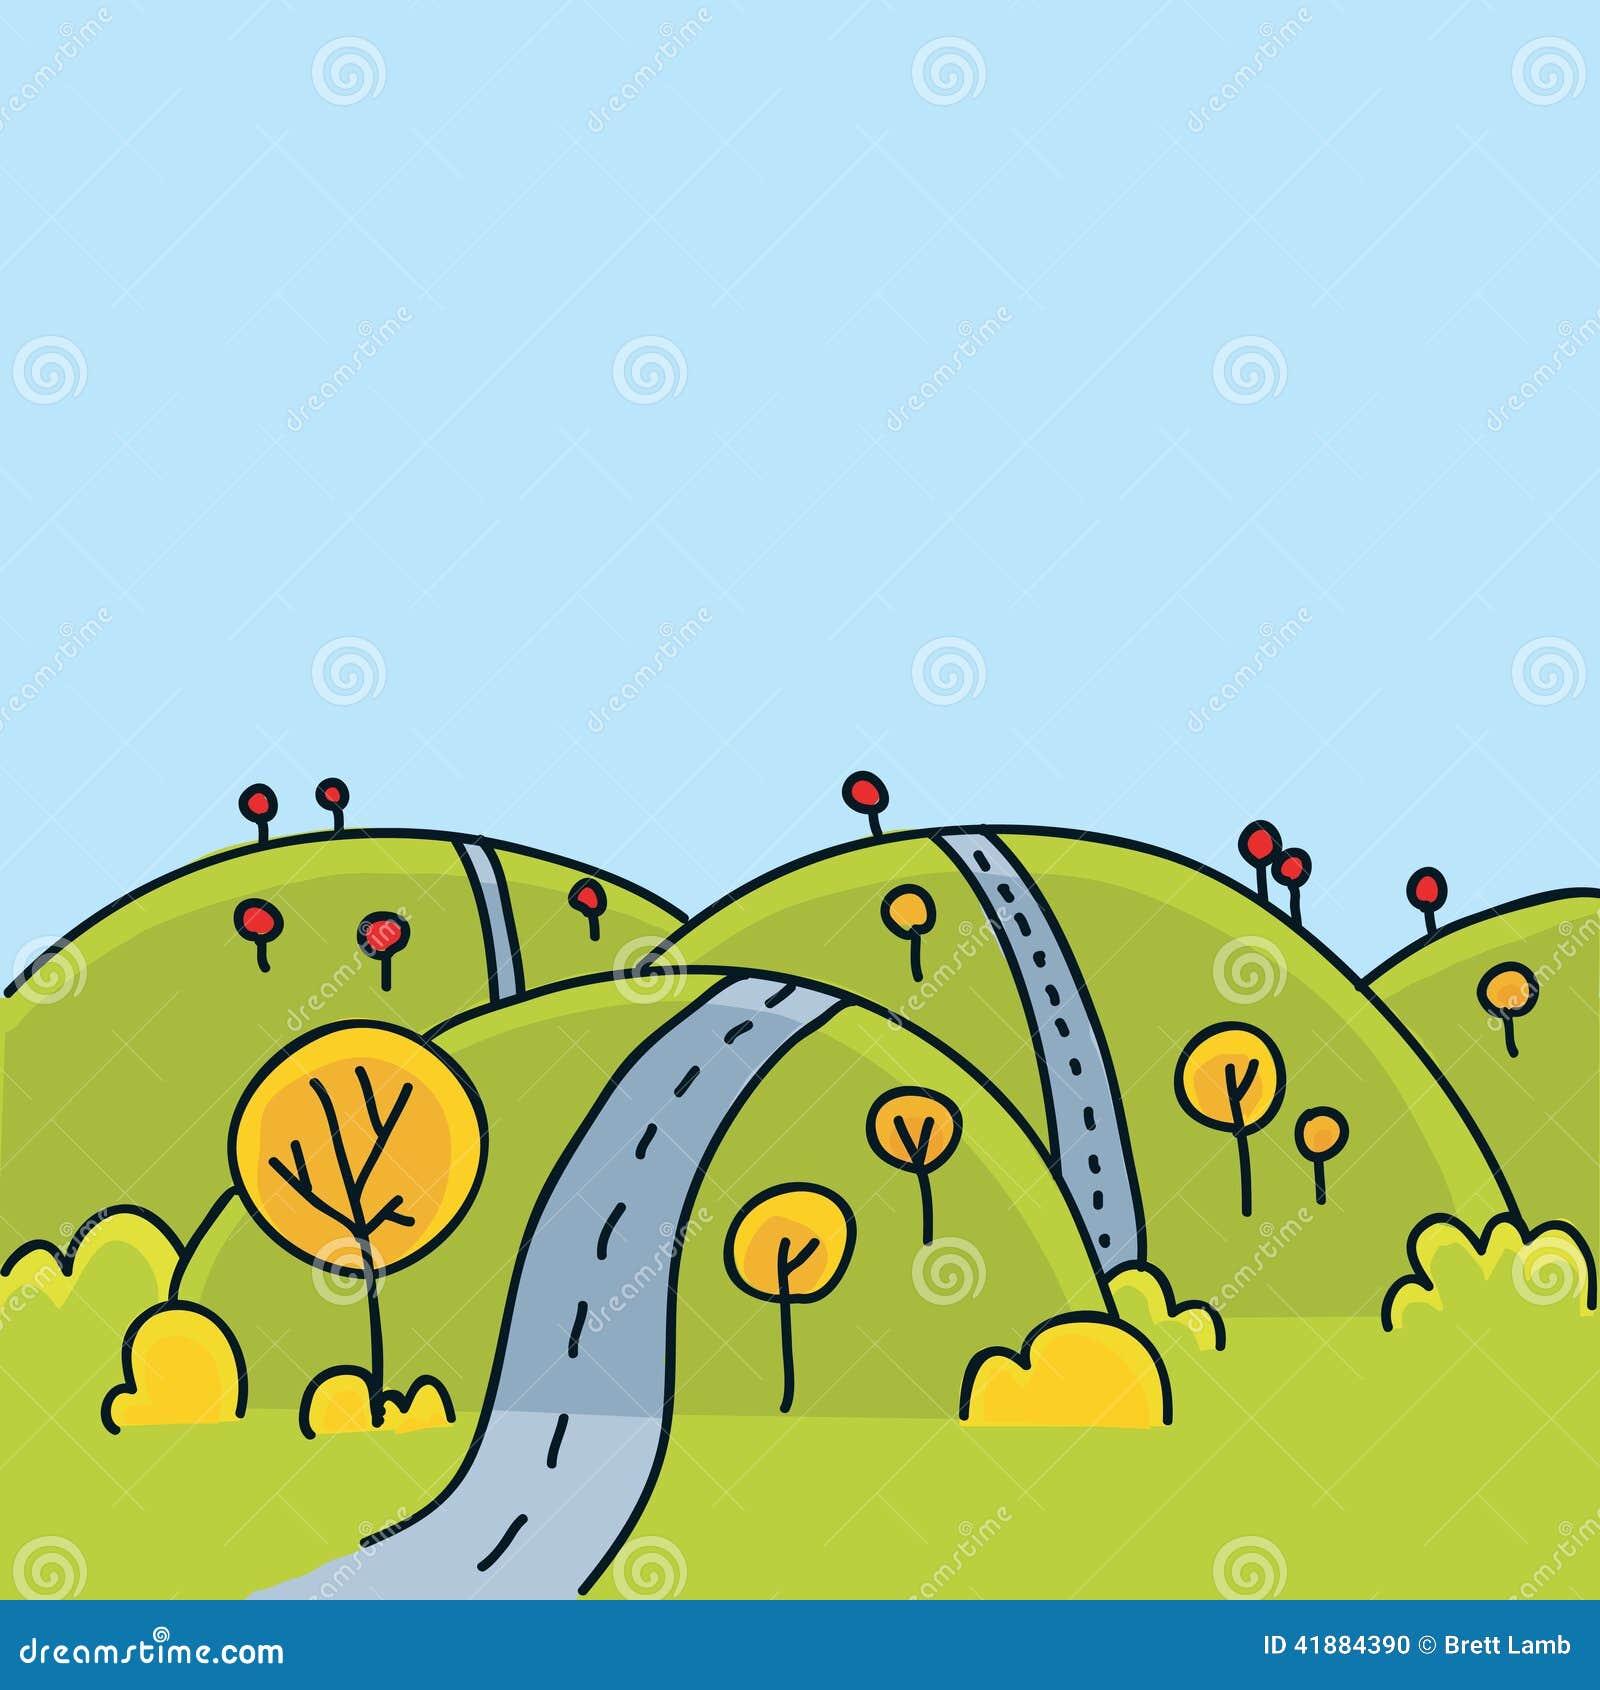 hill road stock illustration image 41884390 lamb clip art black and white lamp clipart